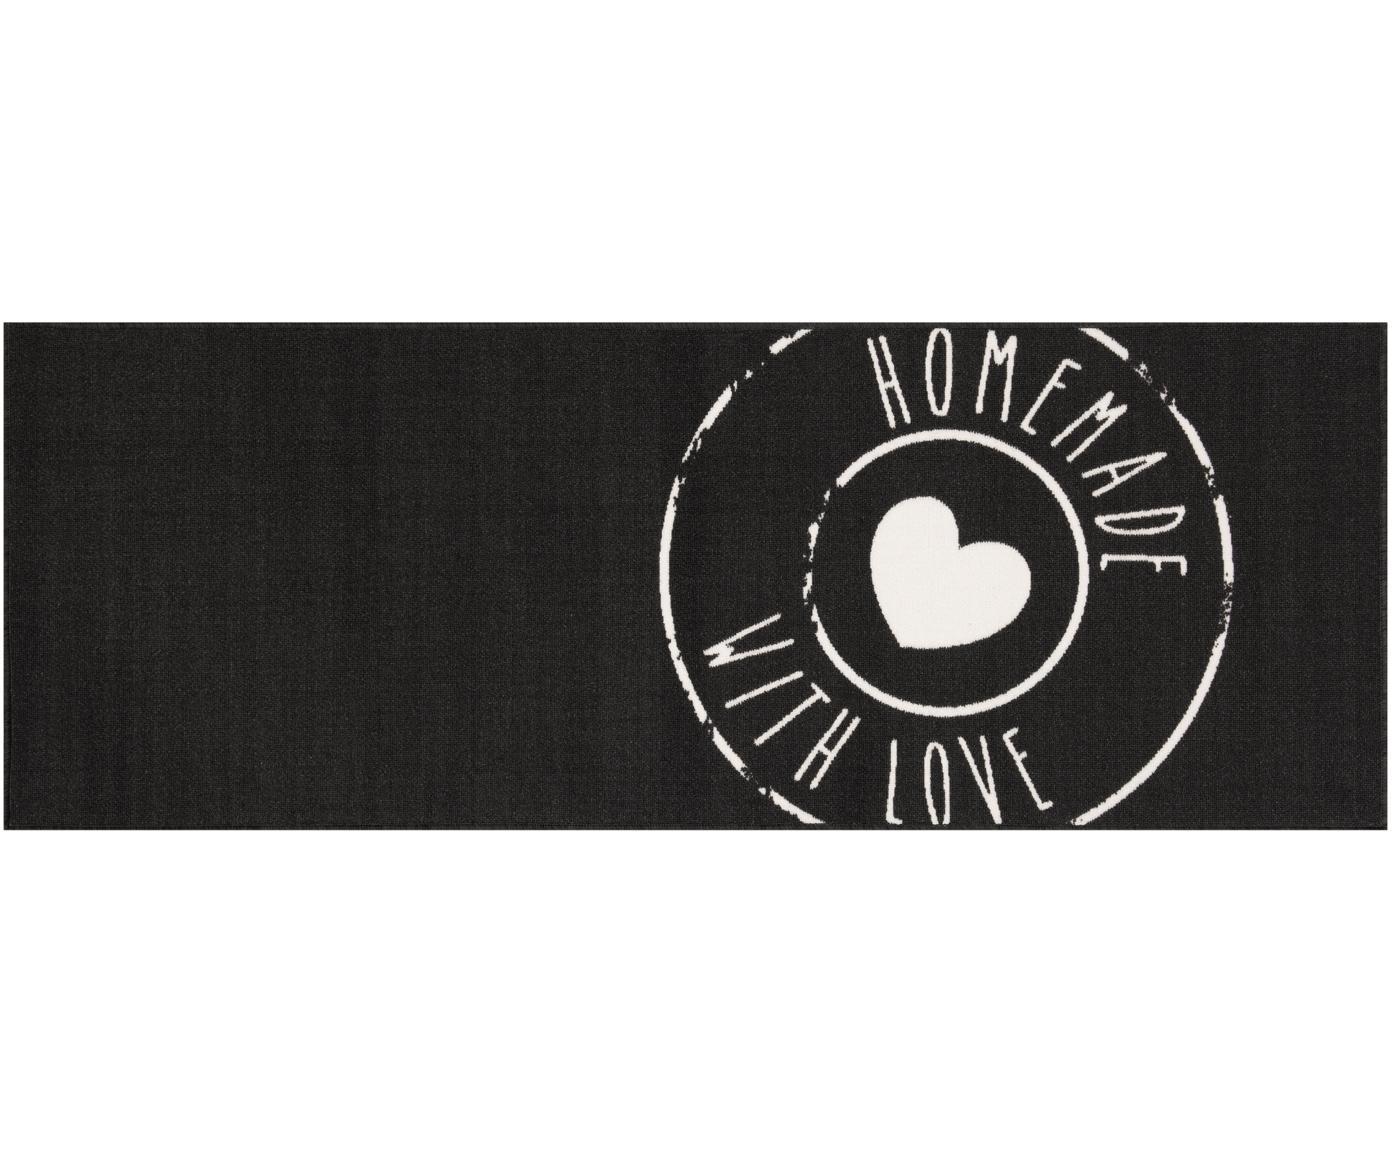 Passatoia da cucina Homemade with Love, antiscivolo, Nero, bianco, Larg. 67 x Lung. 180 cm